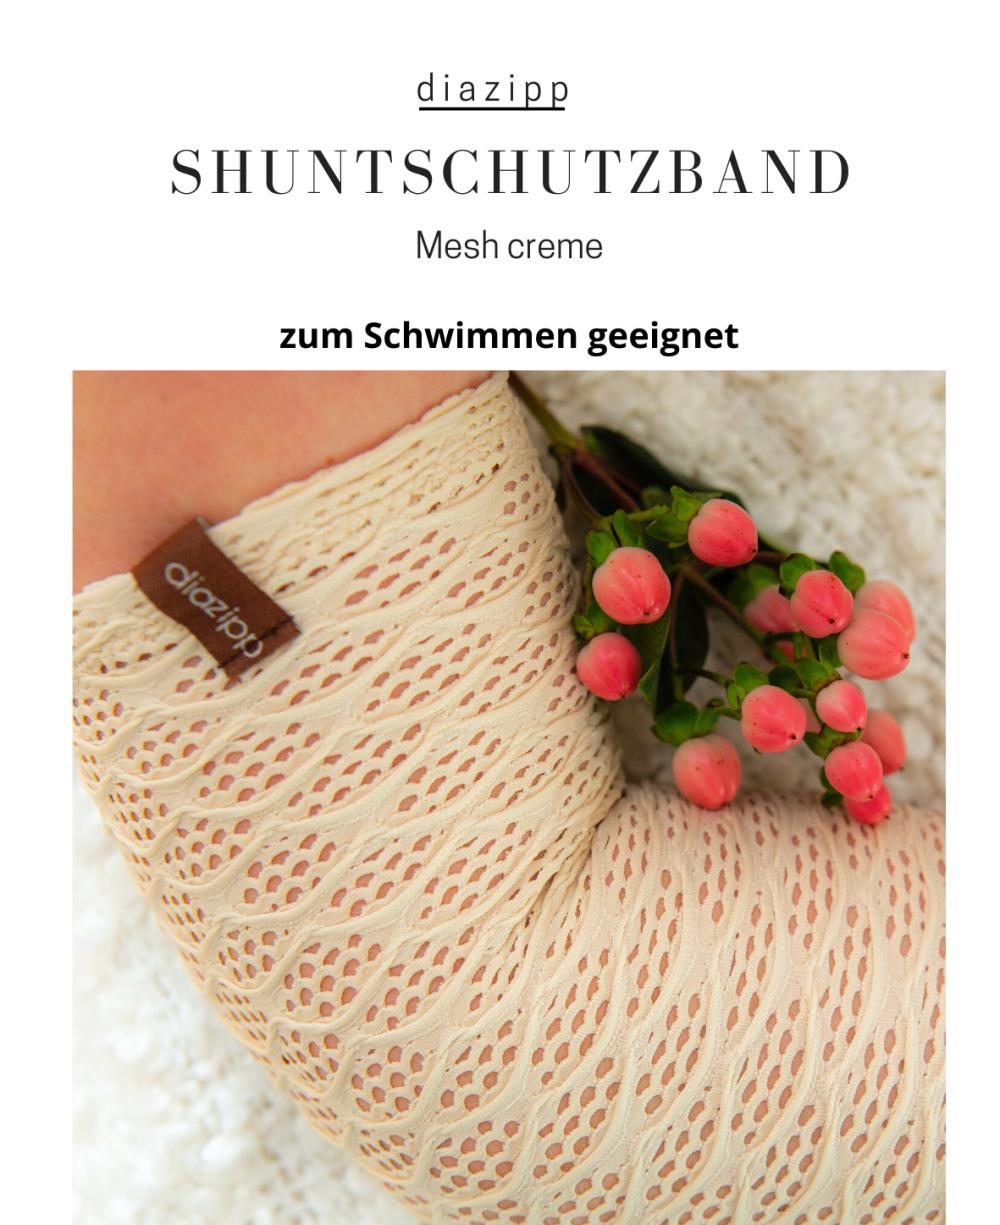 Mesh-creme-damen-Shuntschutzband-für-dialysepatienten-diazipp